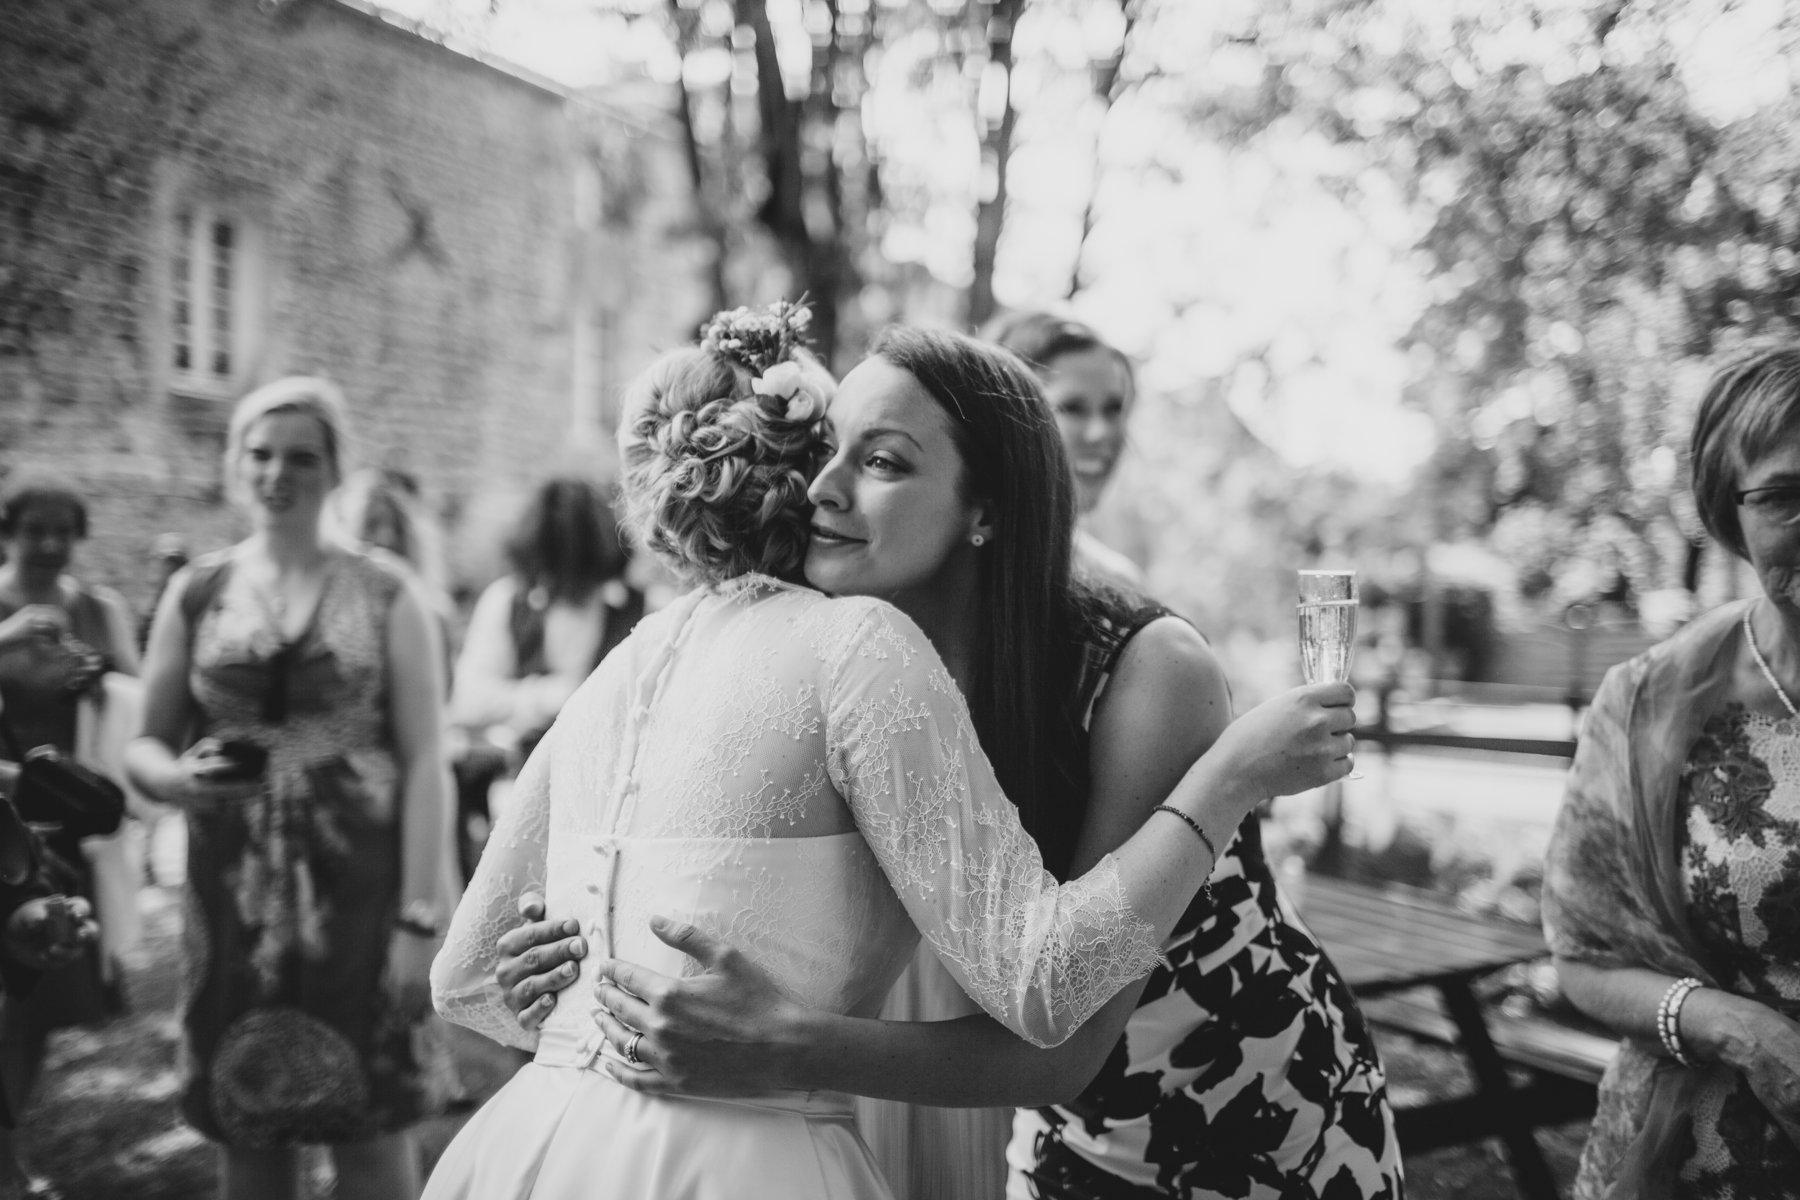 petitmoulin_france_bordeaux_weddings_0057